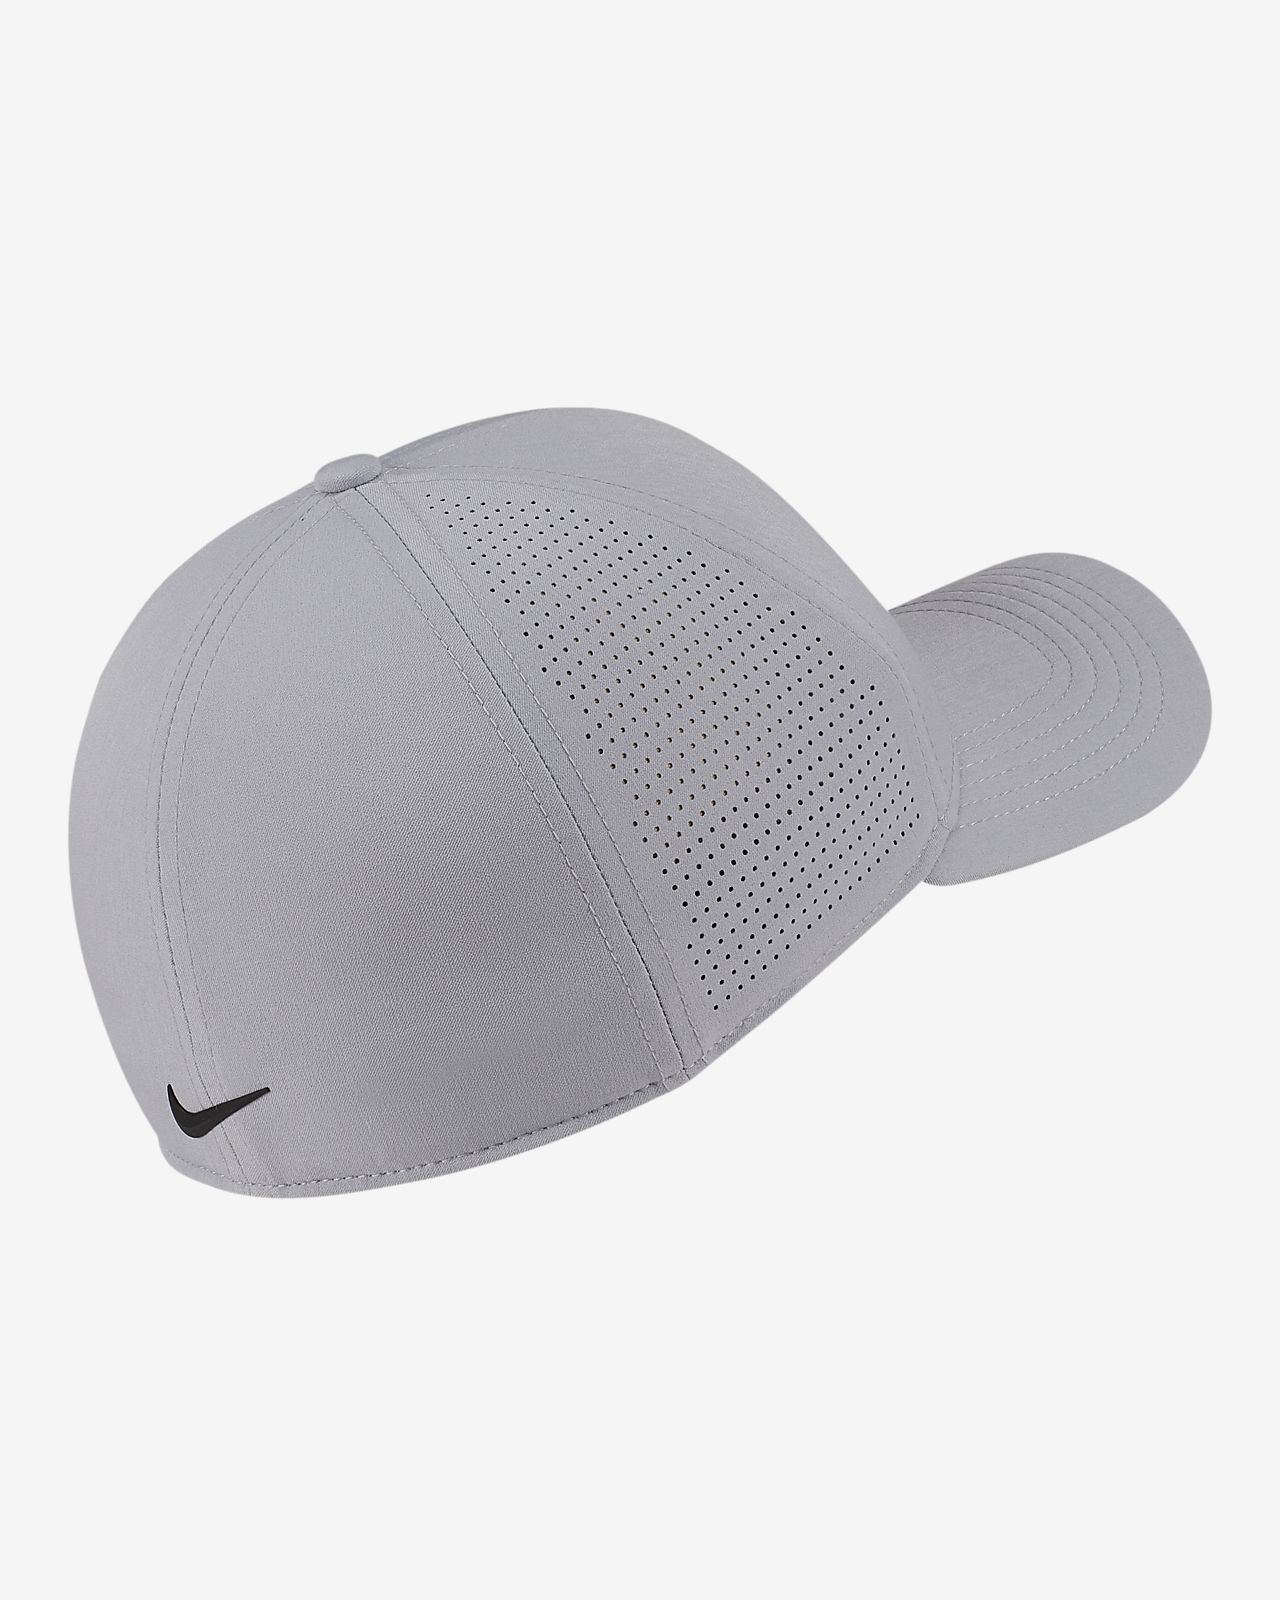 aa47298a Nike AeroBill Classic 99 Fitted Golf Hat. Nike.com GB